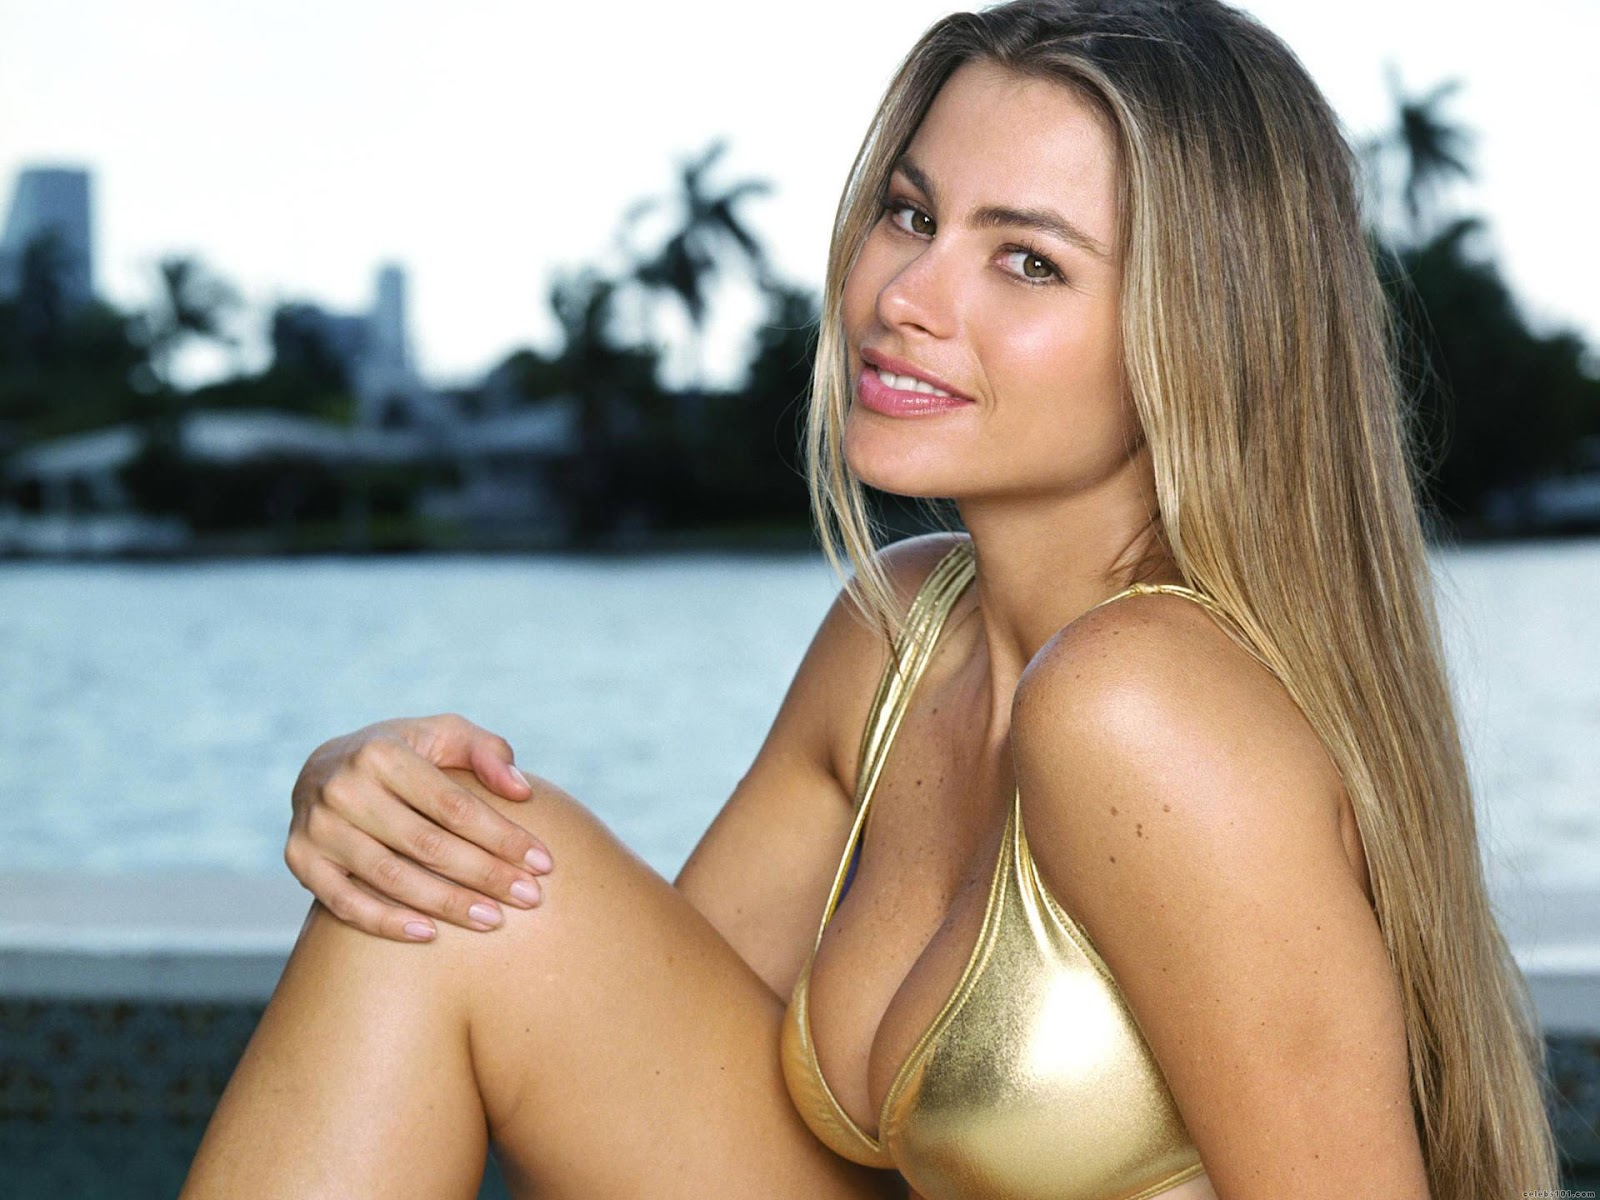 Anal Fayna Vergara vergara anal   www.freee-porns